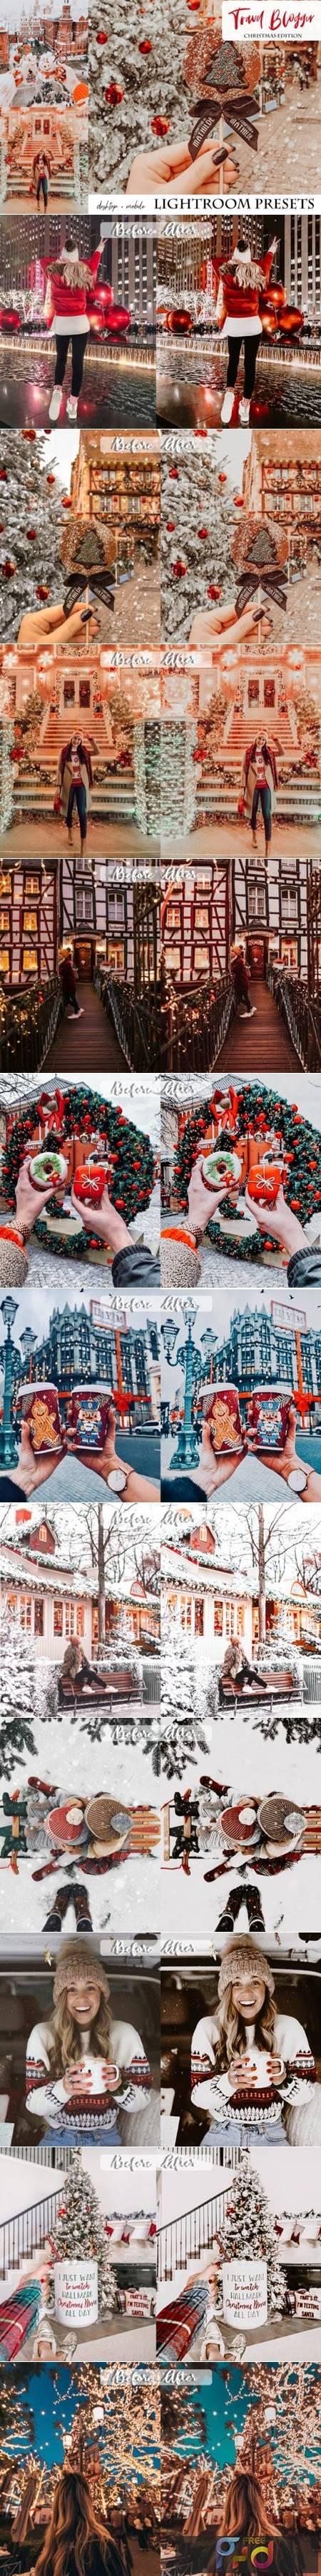 Travel Blogger Christmas Edition Lightroom Presets 5841222 1